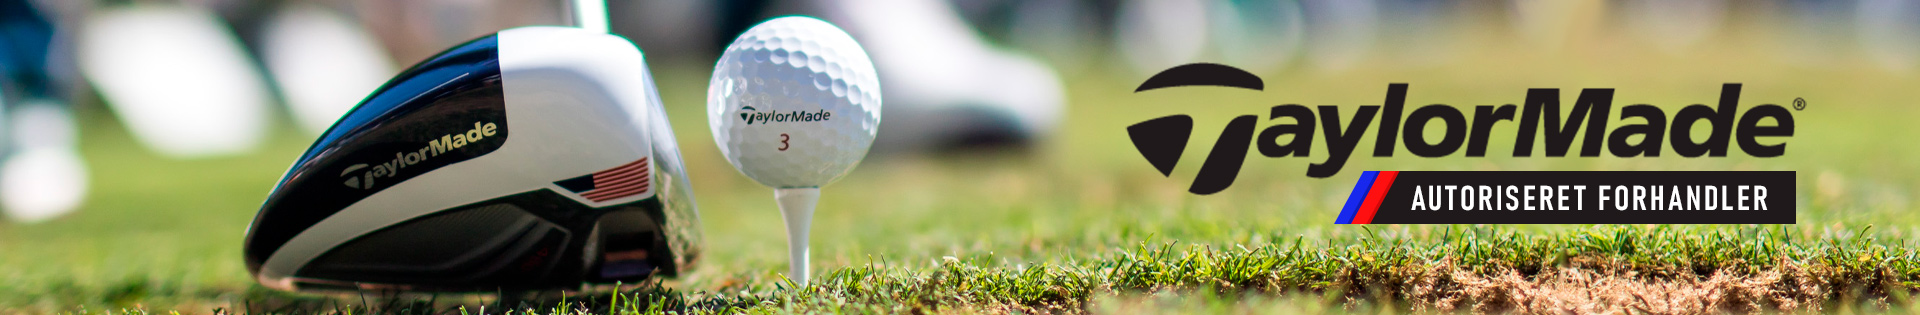 Taylormade golfudstyr